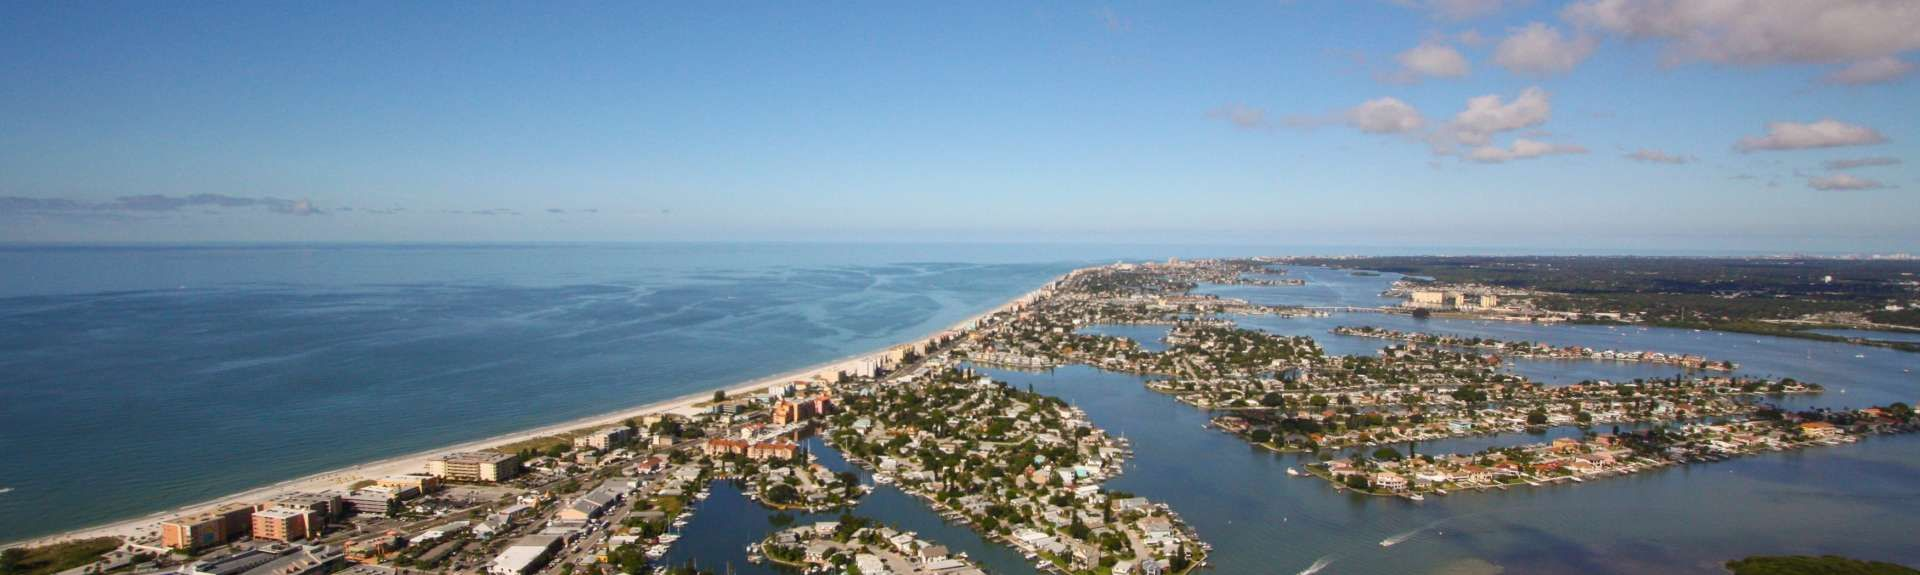 Gulf Winds Resort, Saint Pete Beach, FL, USA